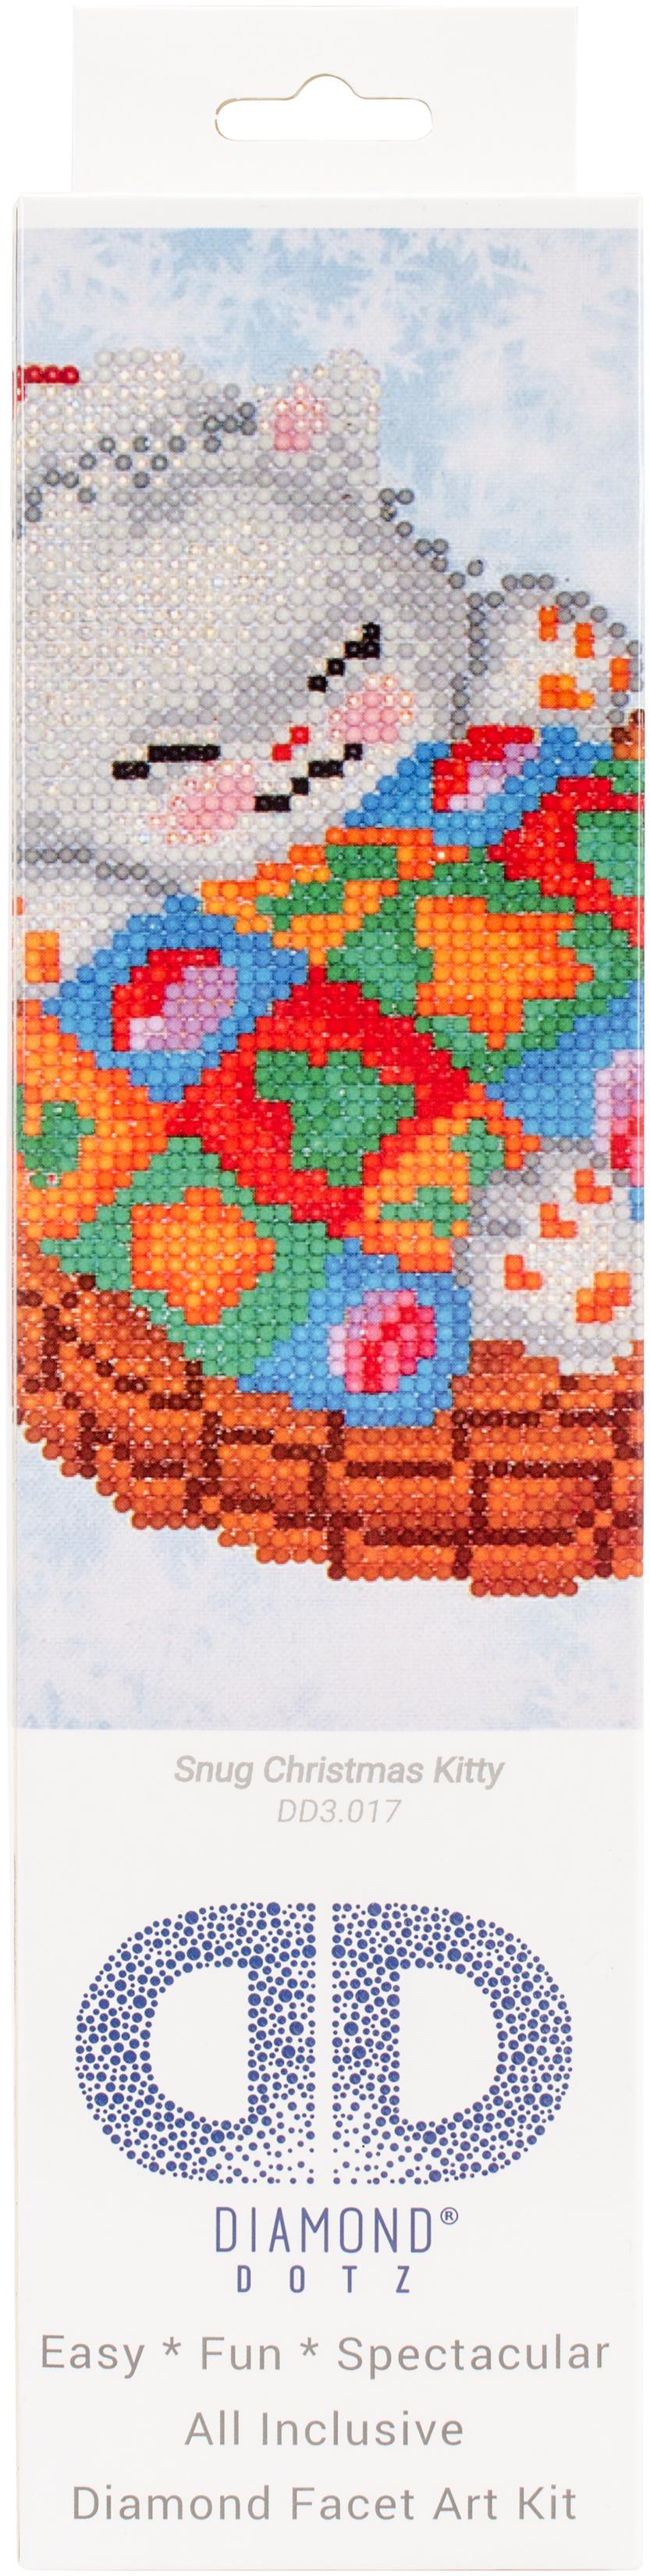 Diamond Dotz Diamond Embroidery Facet Art Kit 11X11.75-Snug Christmas Kitty